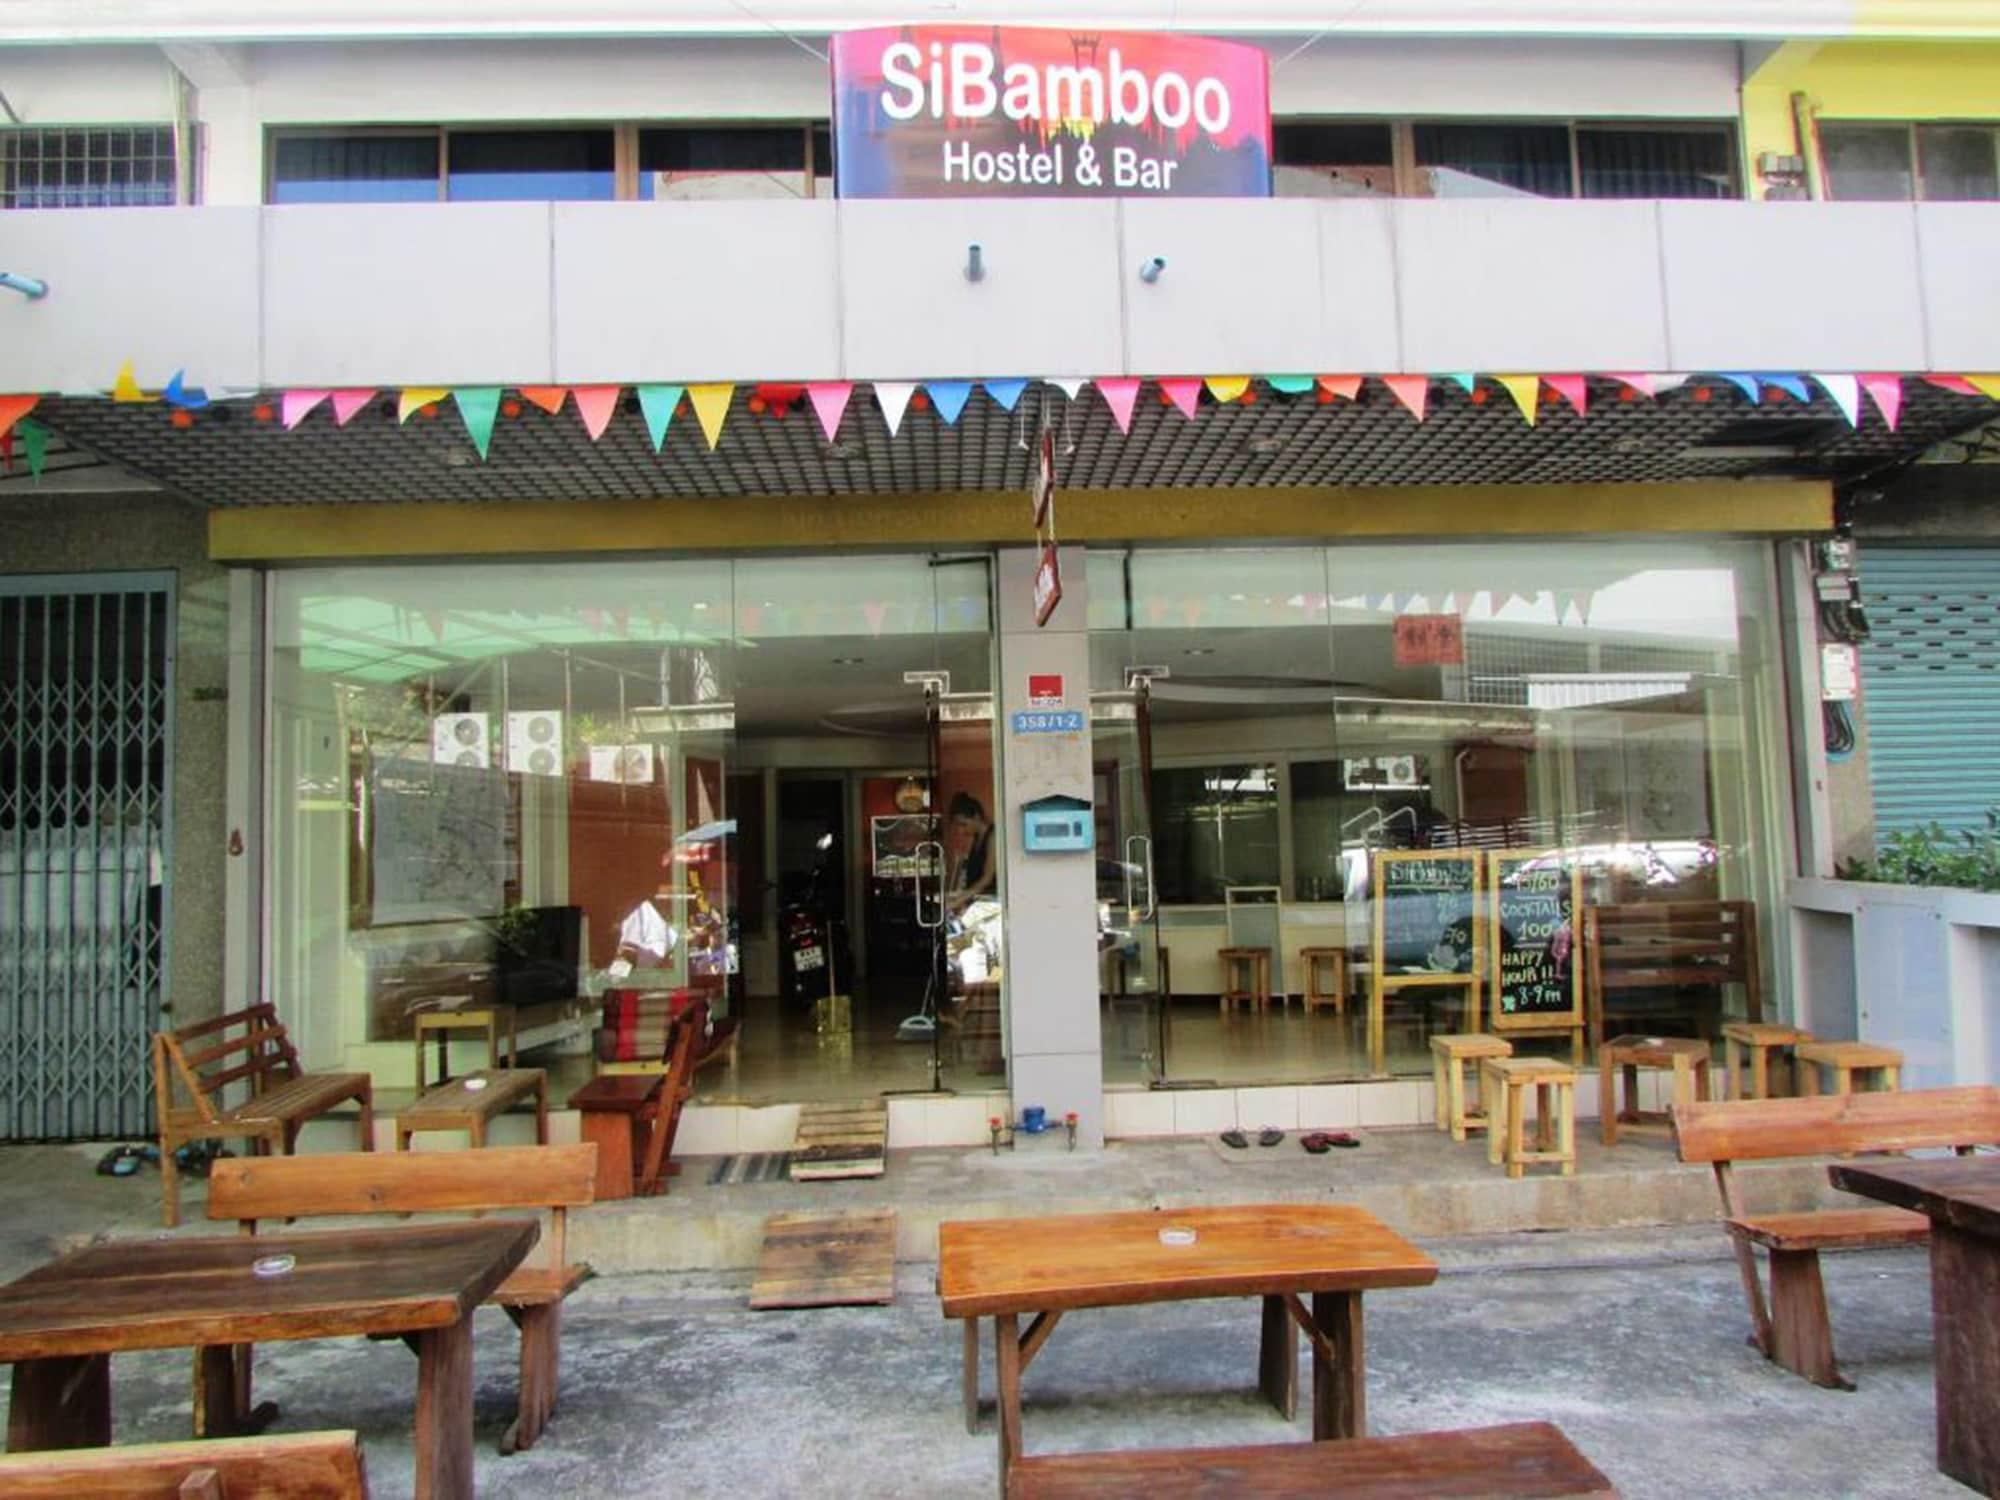 SiBamboo Hostel & Bar, Phra Nakhon